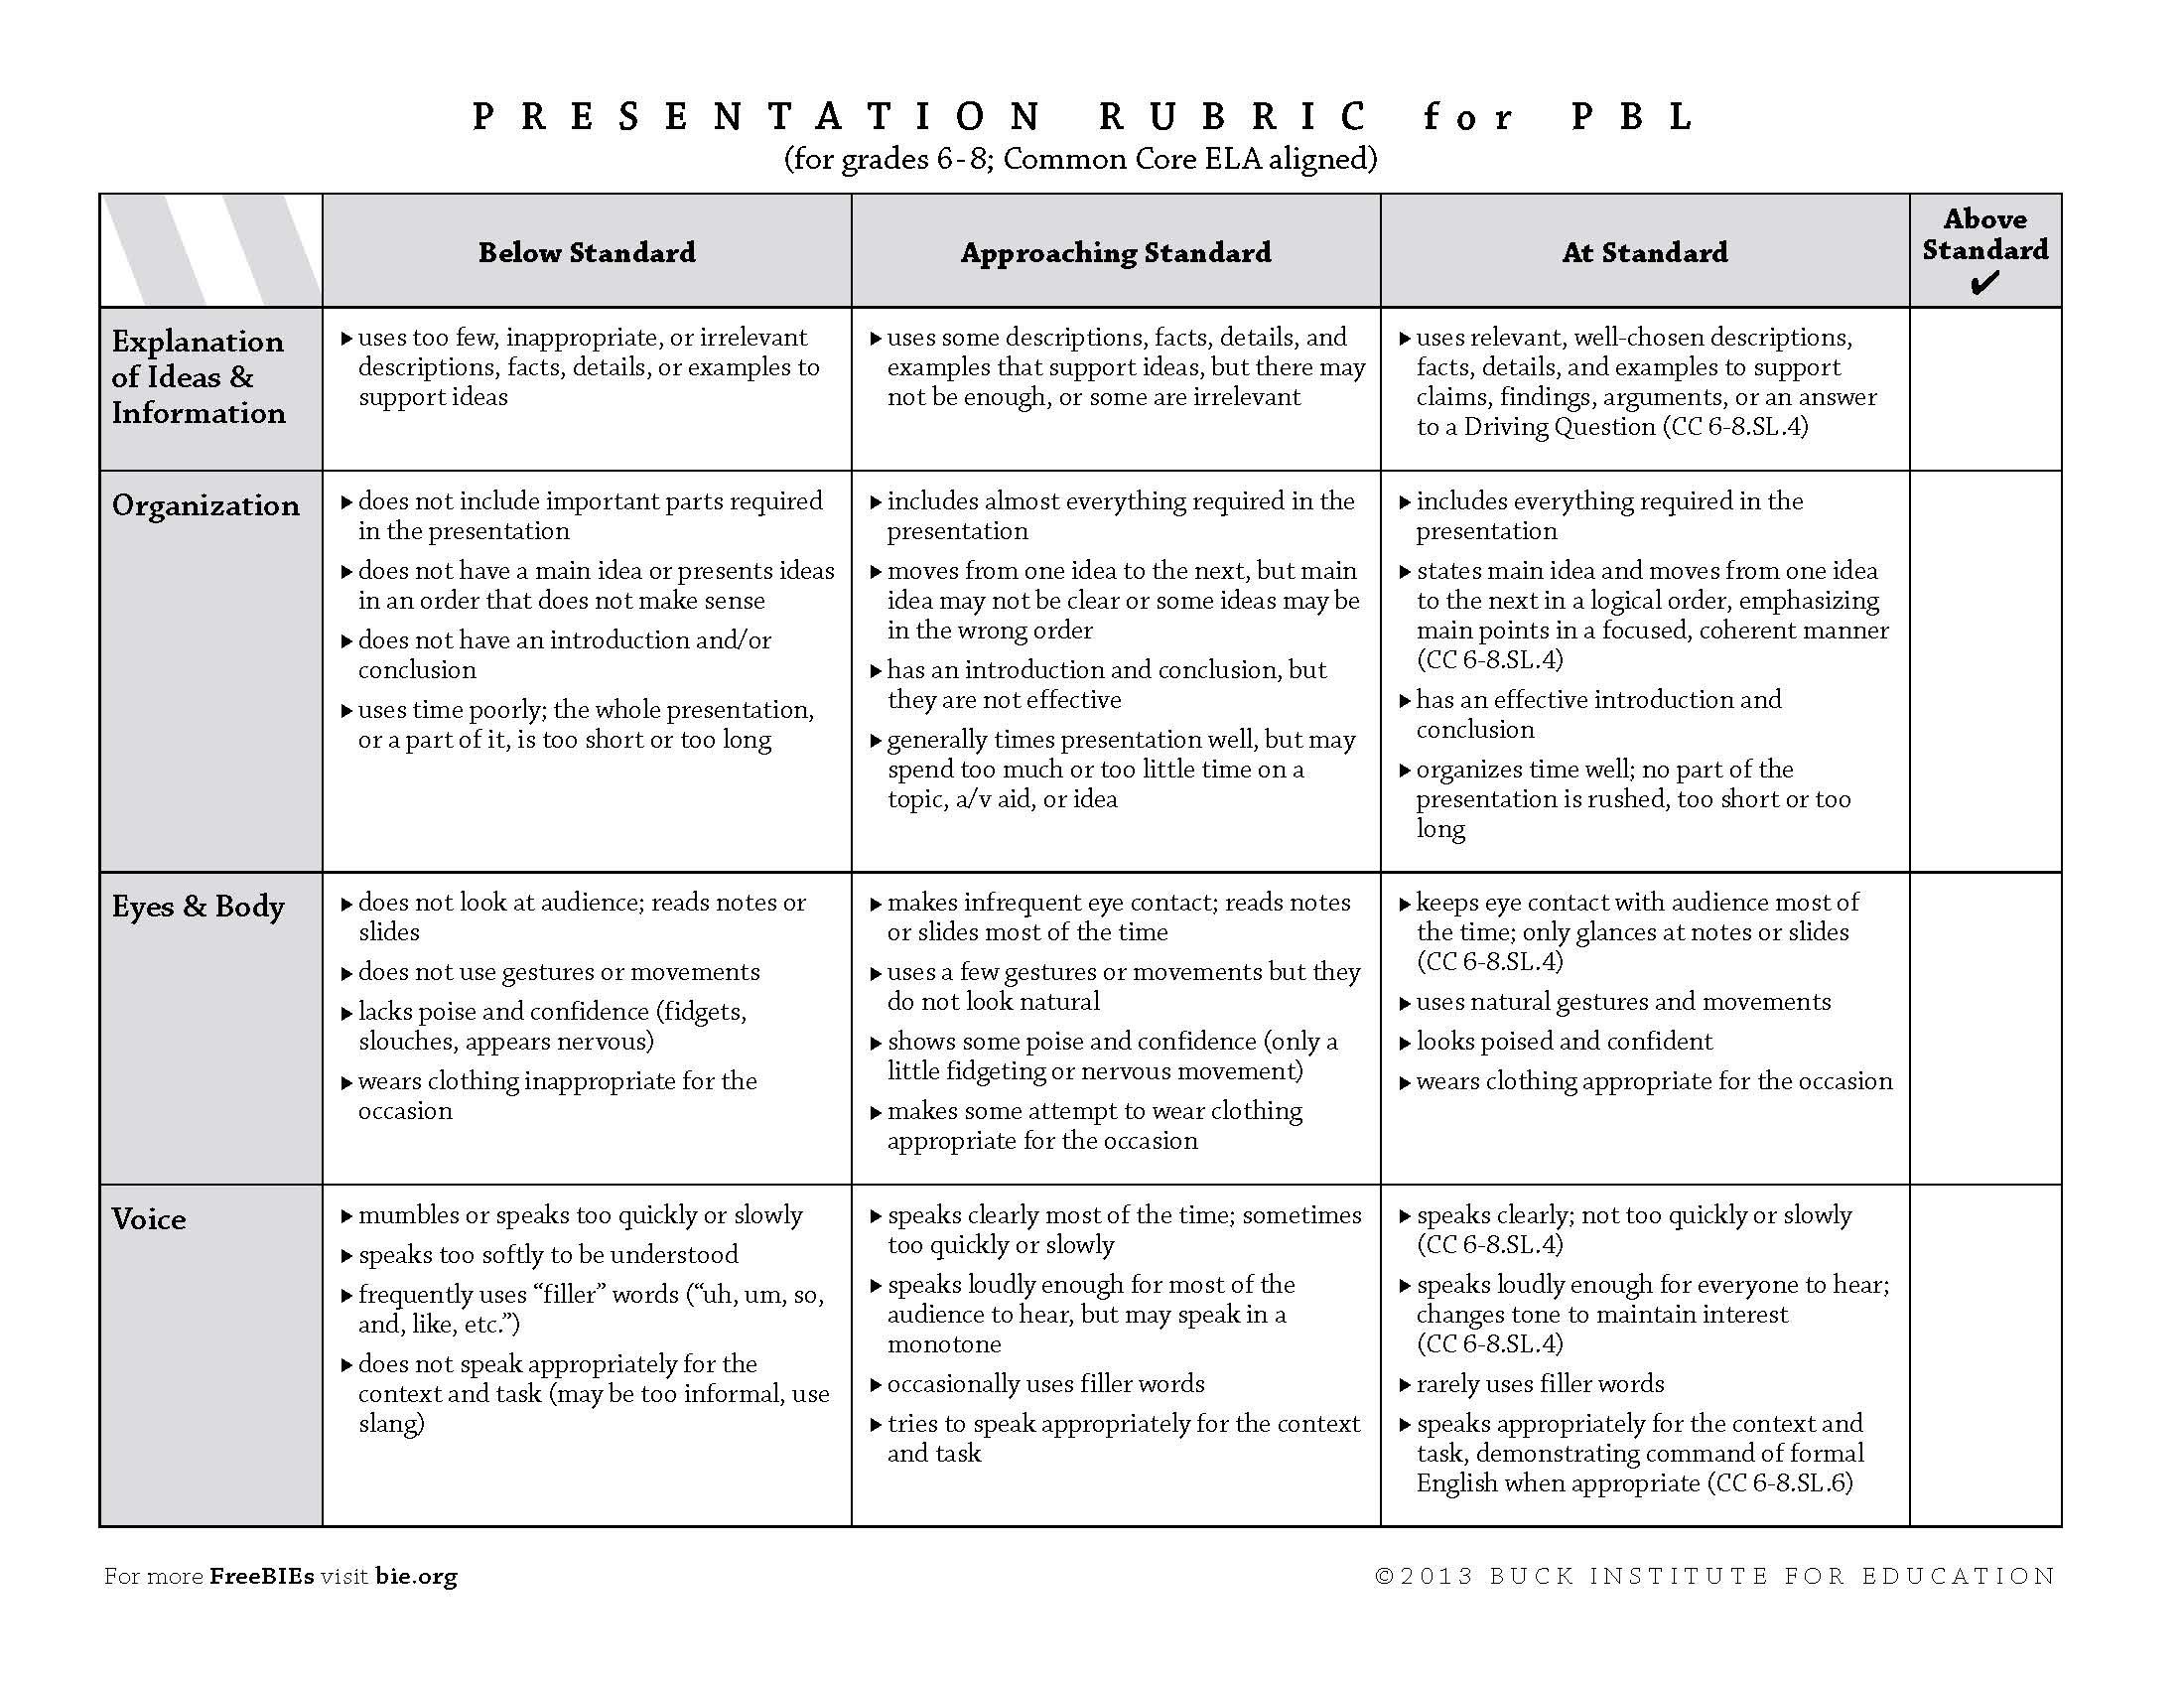 Pbl Presentation Rubric Ela Common Core